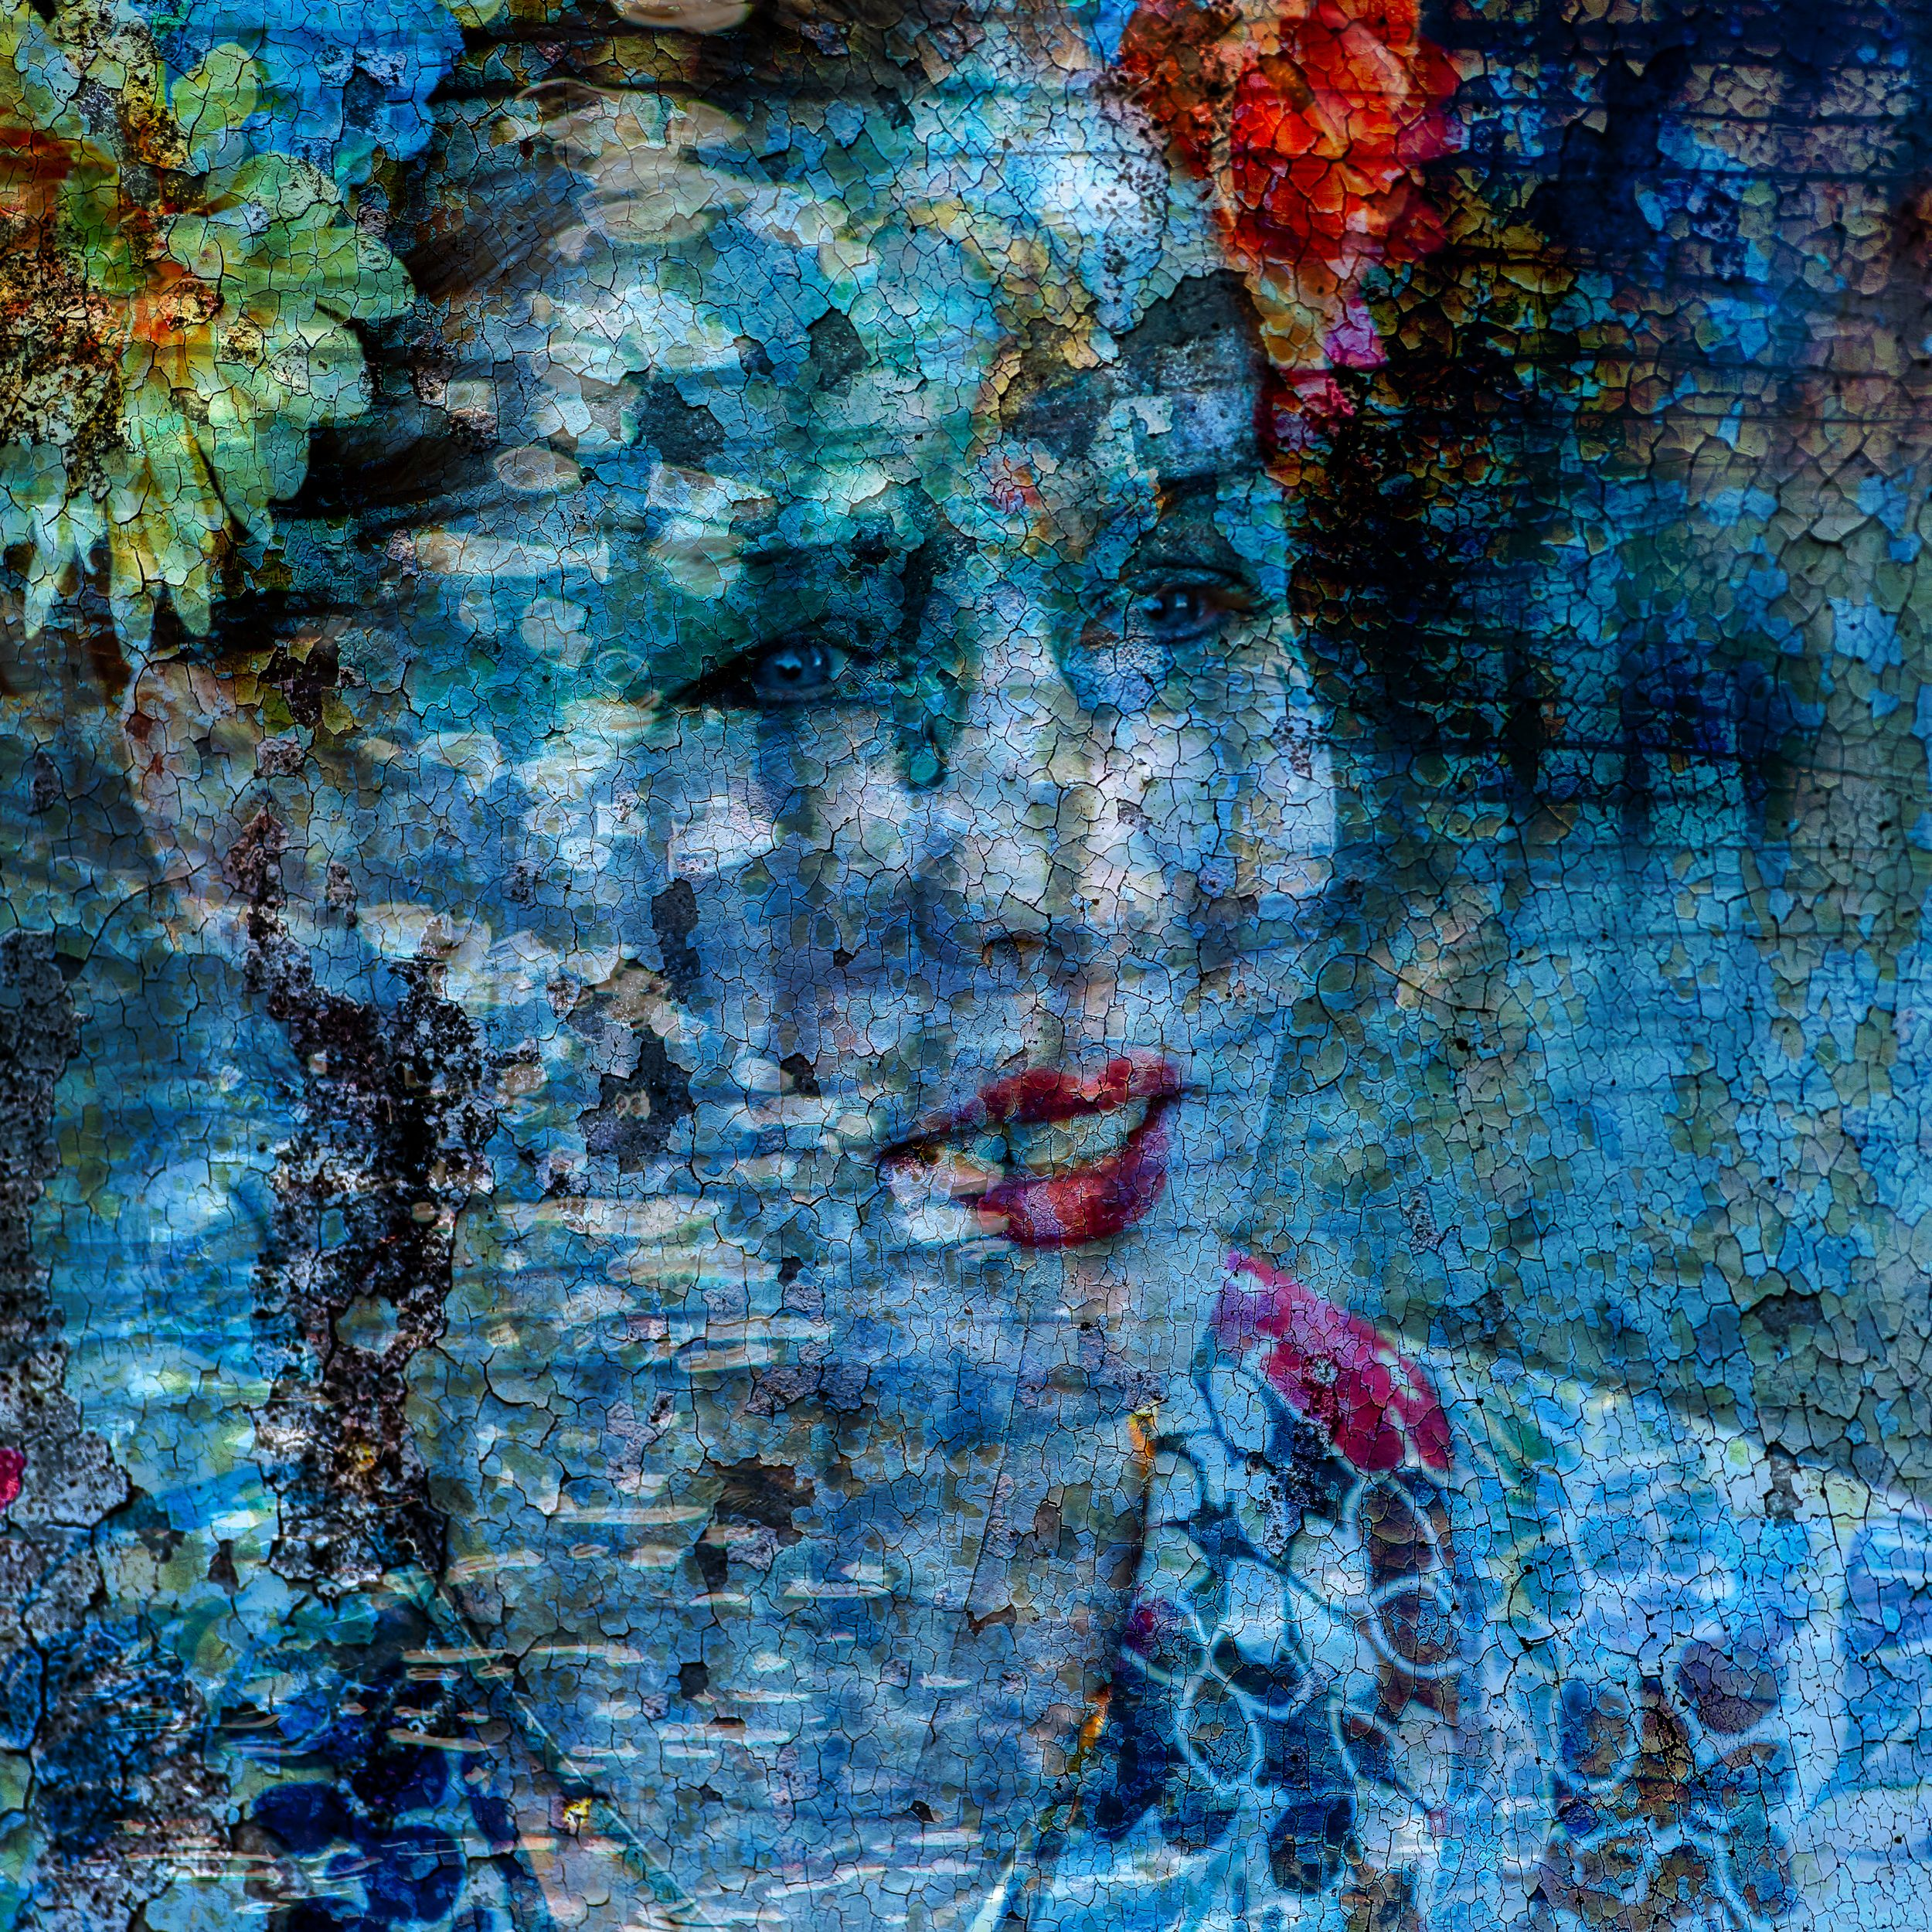 Vicky Stromee, Piercing the Veil